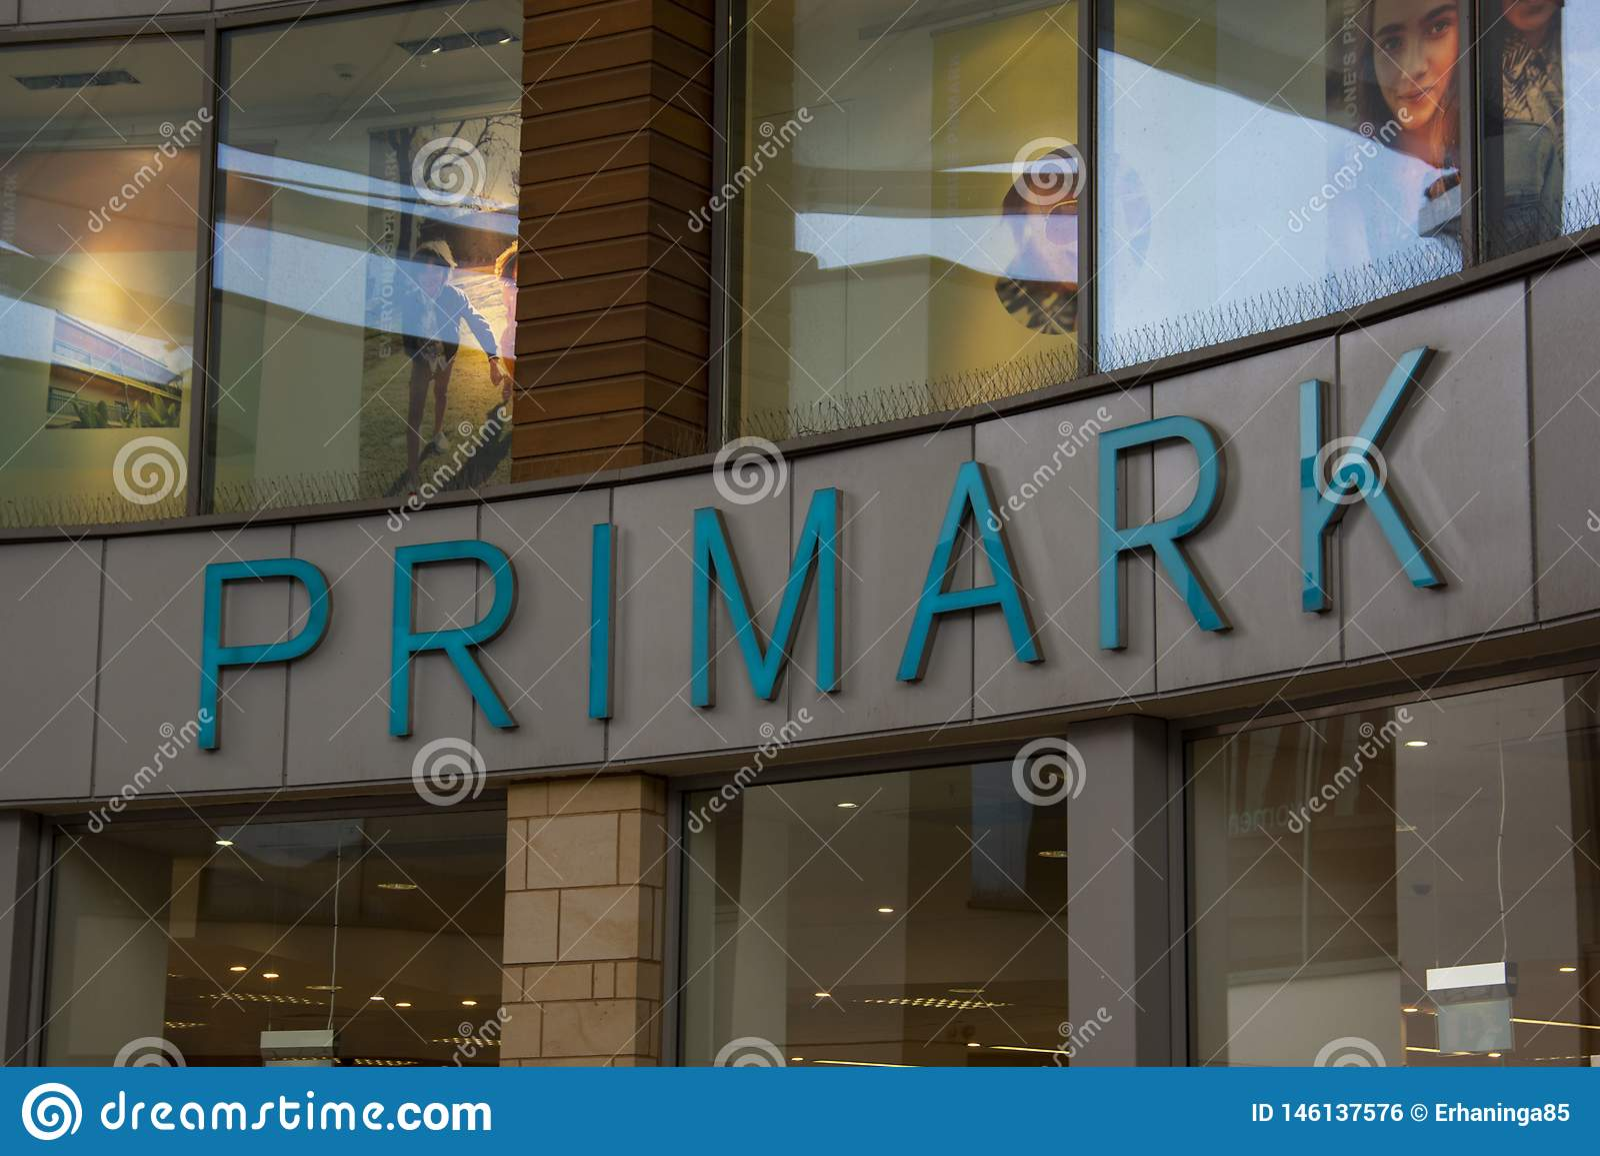 Corby, Ηνωμένο Βασίλειο 29 Απριλίου, 2019 - Primark, λογότυπο από το εξωτερικό κατάστημα Τα σημαντικότερα λιανικά λειτουργούντα κ